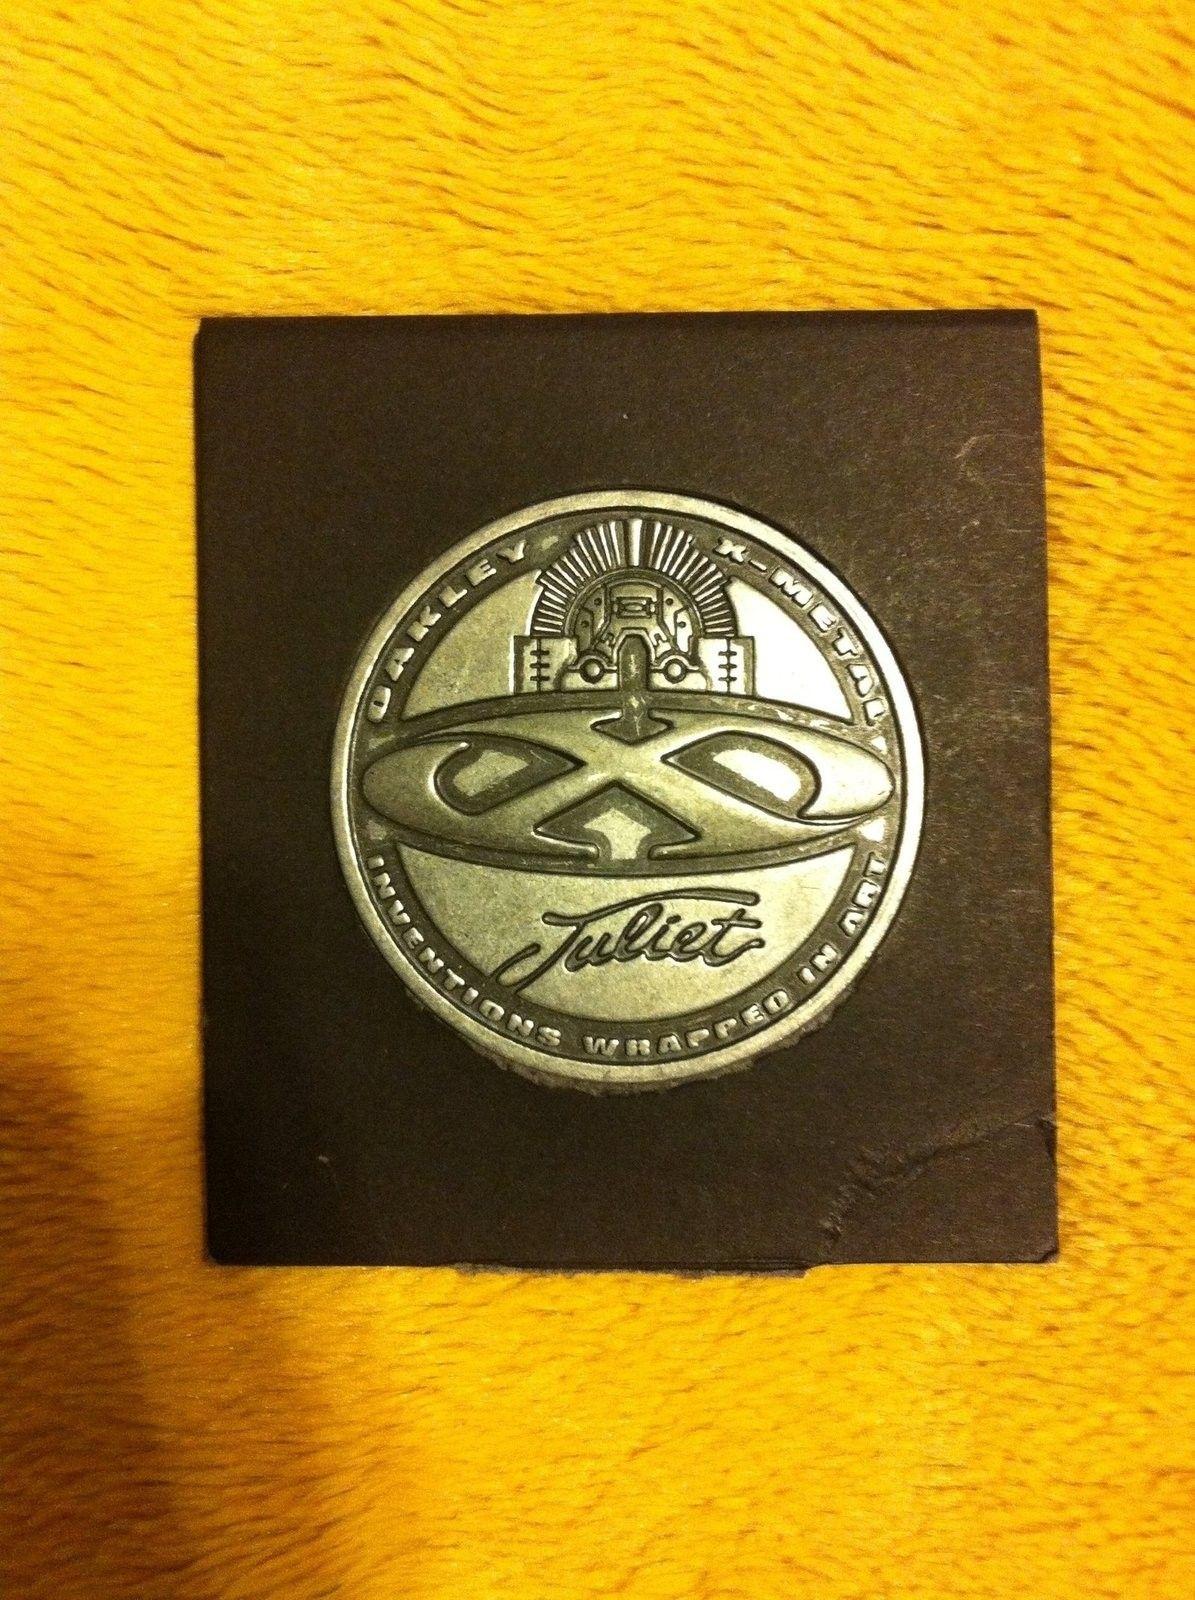 Juliet X-Metal Coin - image.jpg